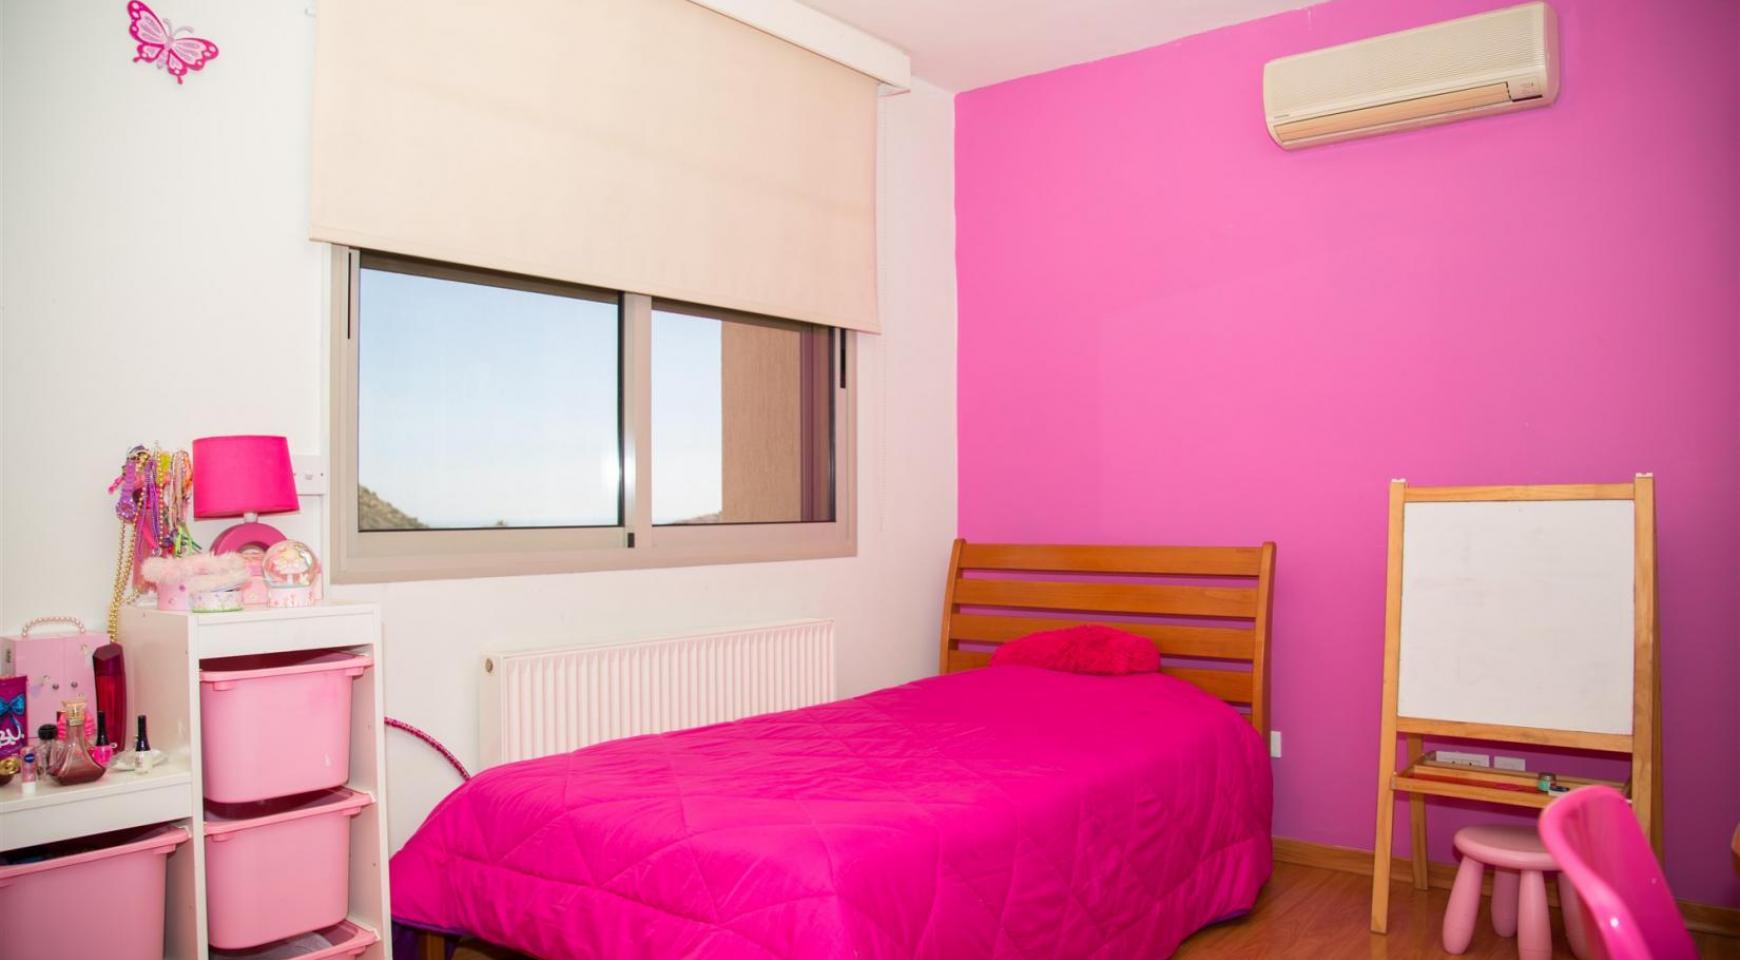 Modern Luxury 4 Bedroom Villa in Sfalagiotisa, Agios Athanasios - 26